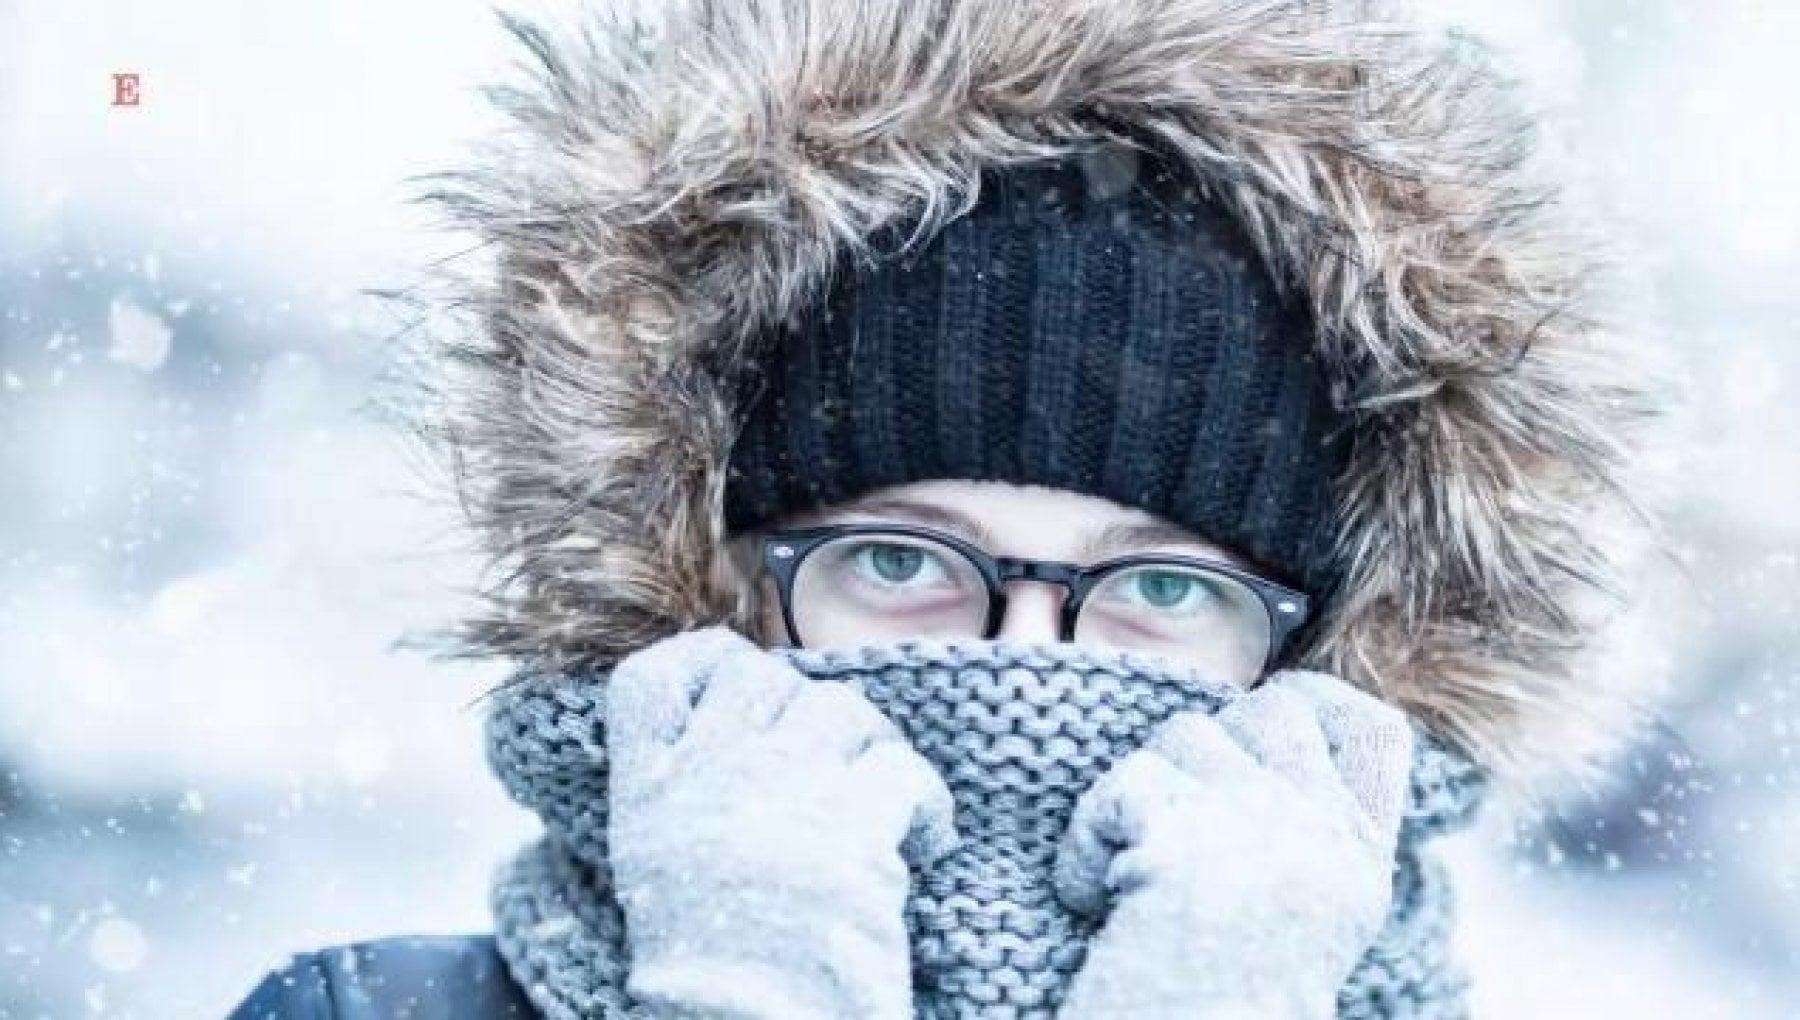 115147164 b897970c f506 4bdc 9370 0ccee57c3187 - Previsioni meteo, arriva Burian: ondata di gelo e neve nel weekend di San Valentino